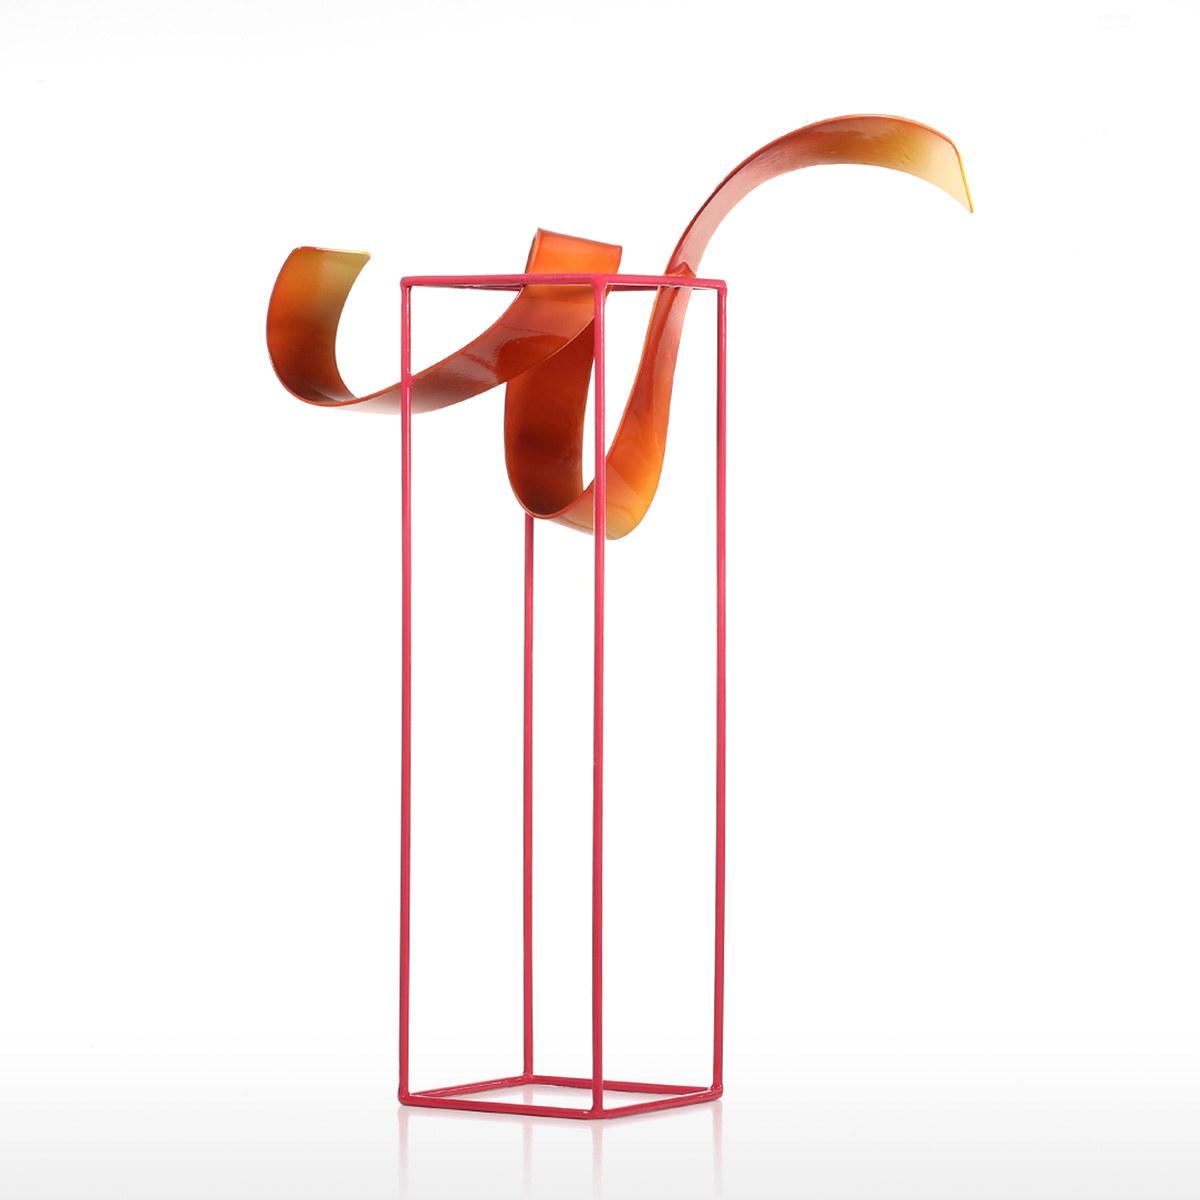 Bud Freistehende Skulptur-Abstrakte Indoor / Outdoor Moderne Metall ...